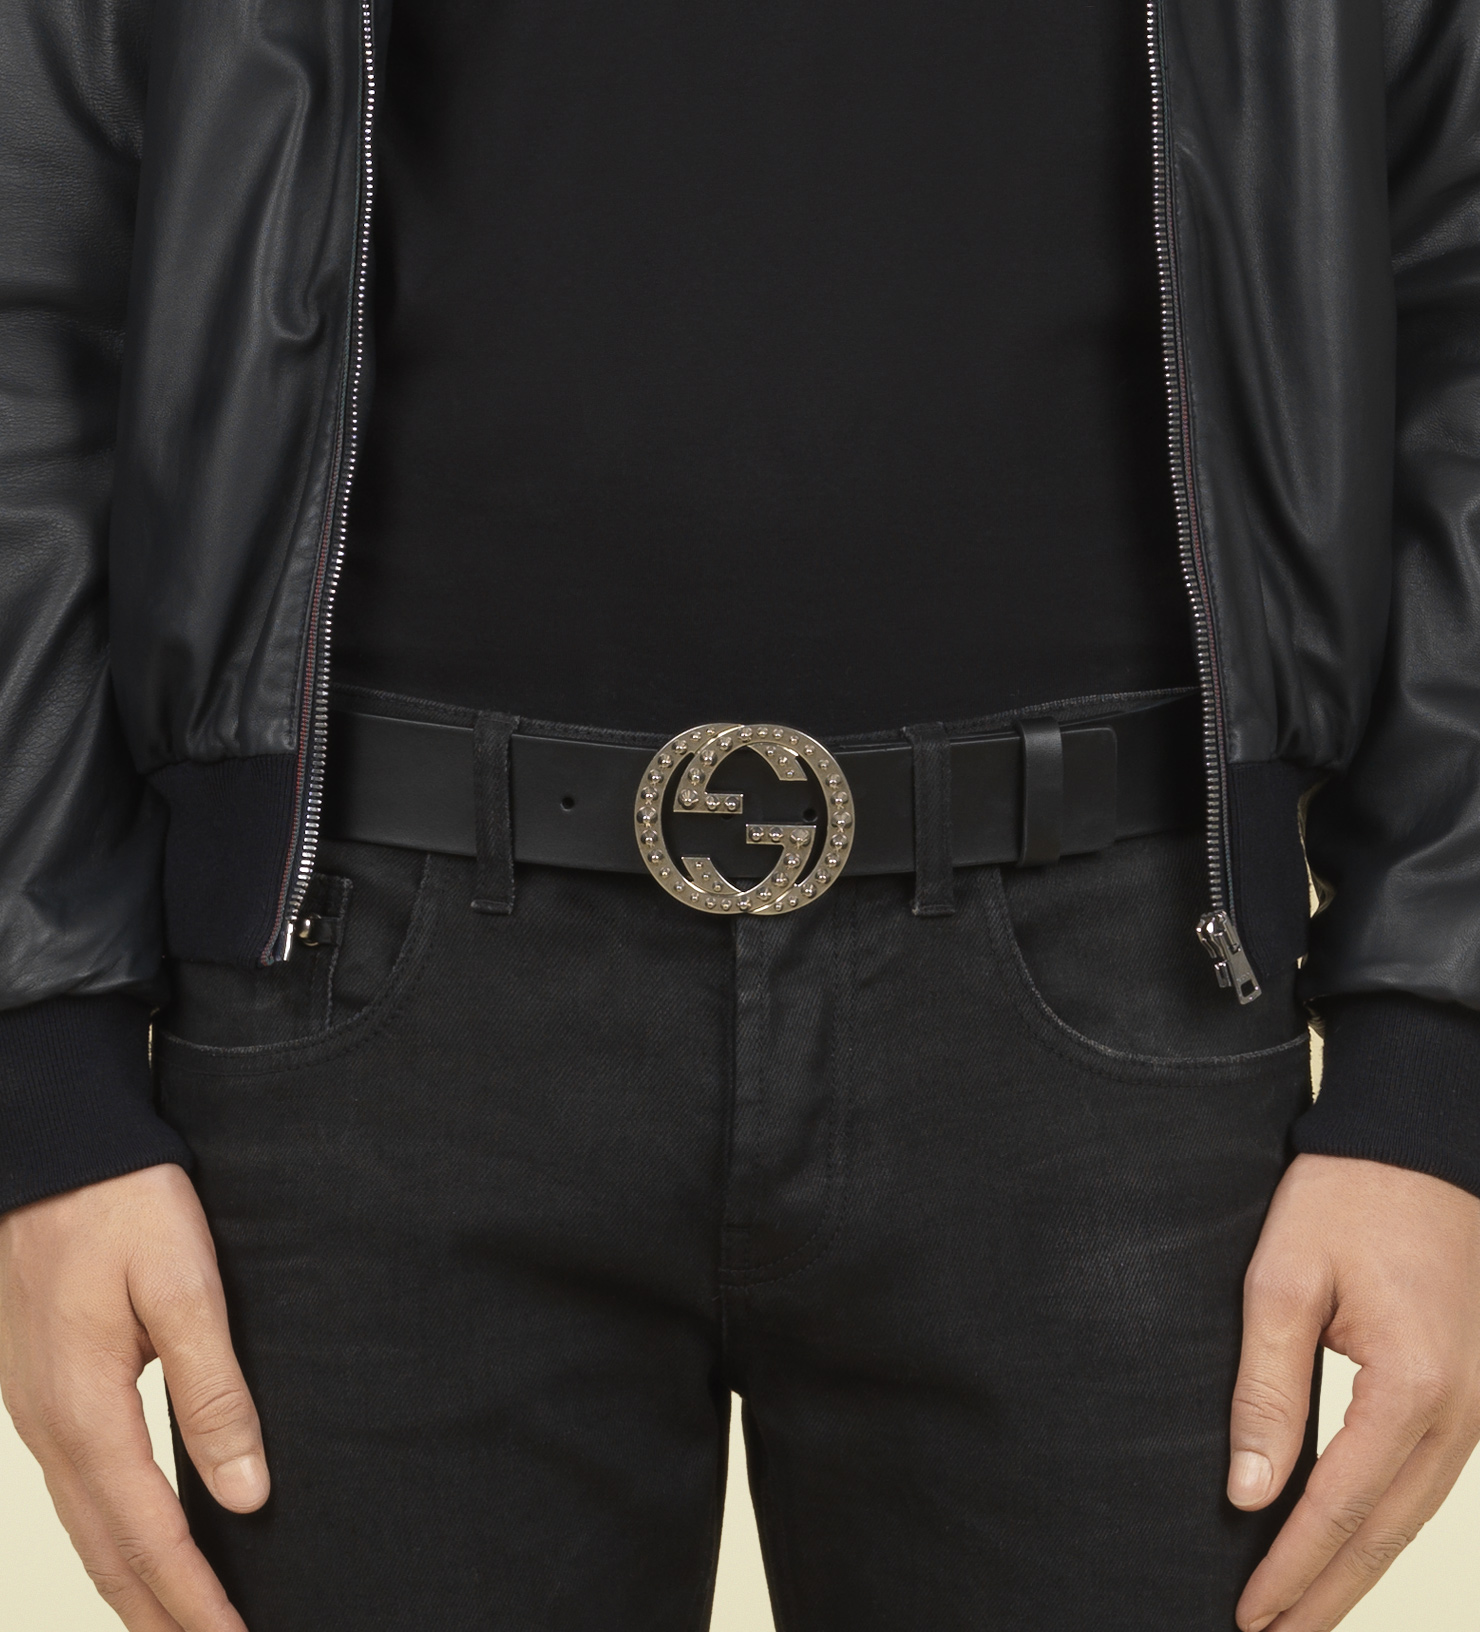 gucci black leather belt with studded interlocking g